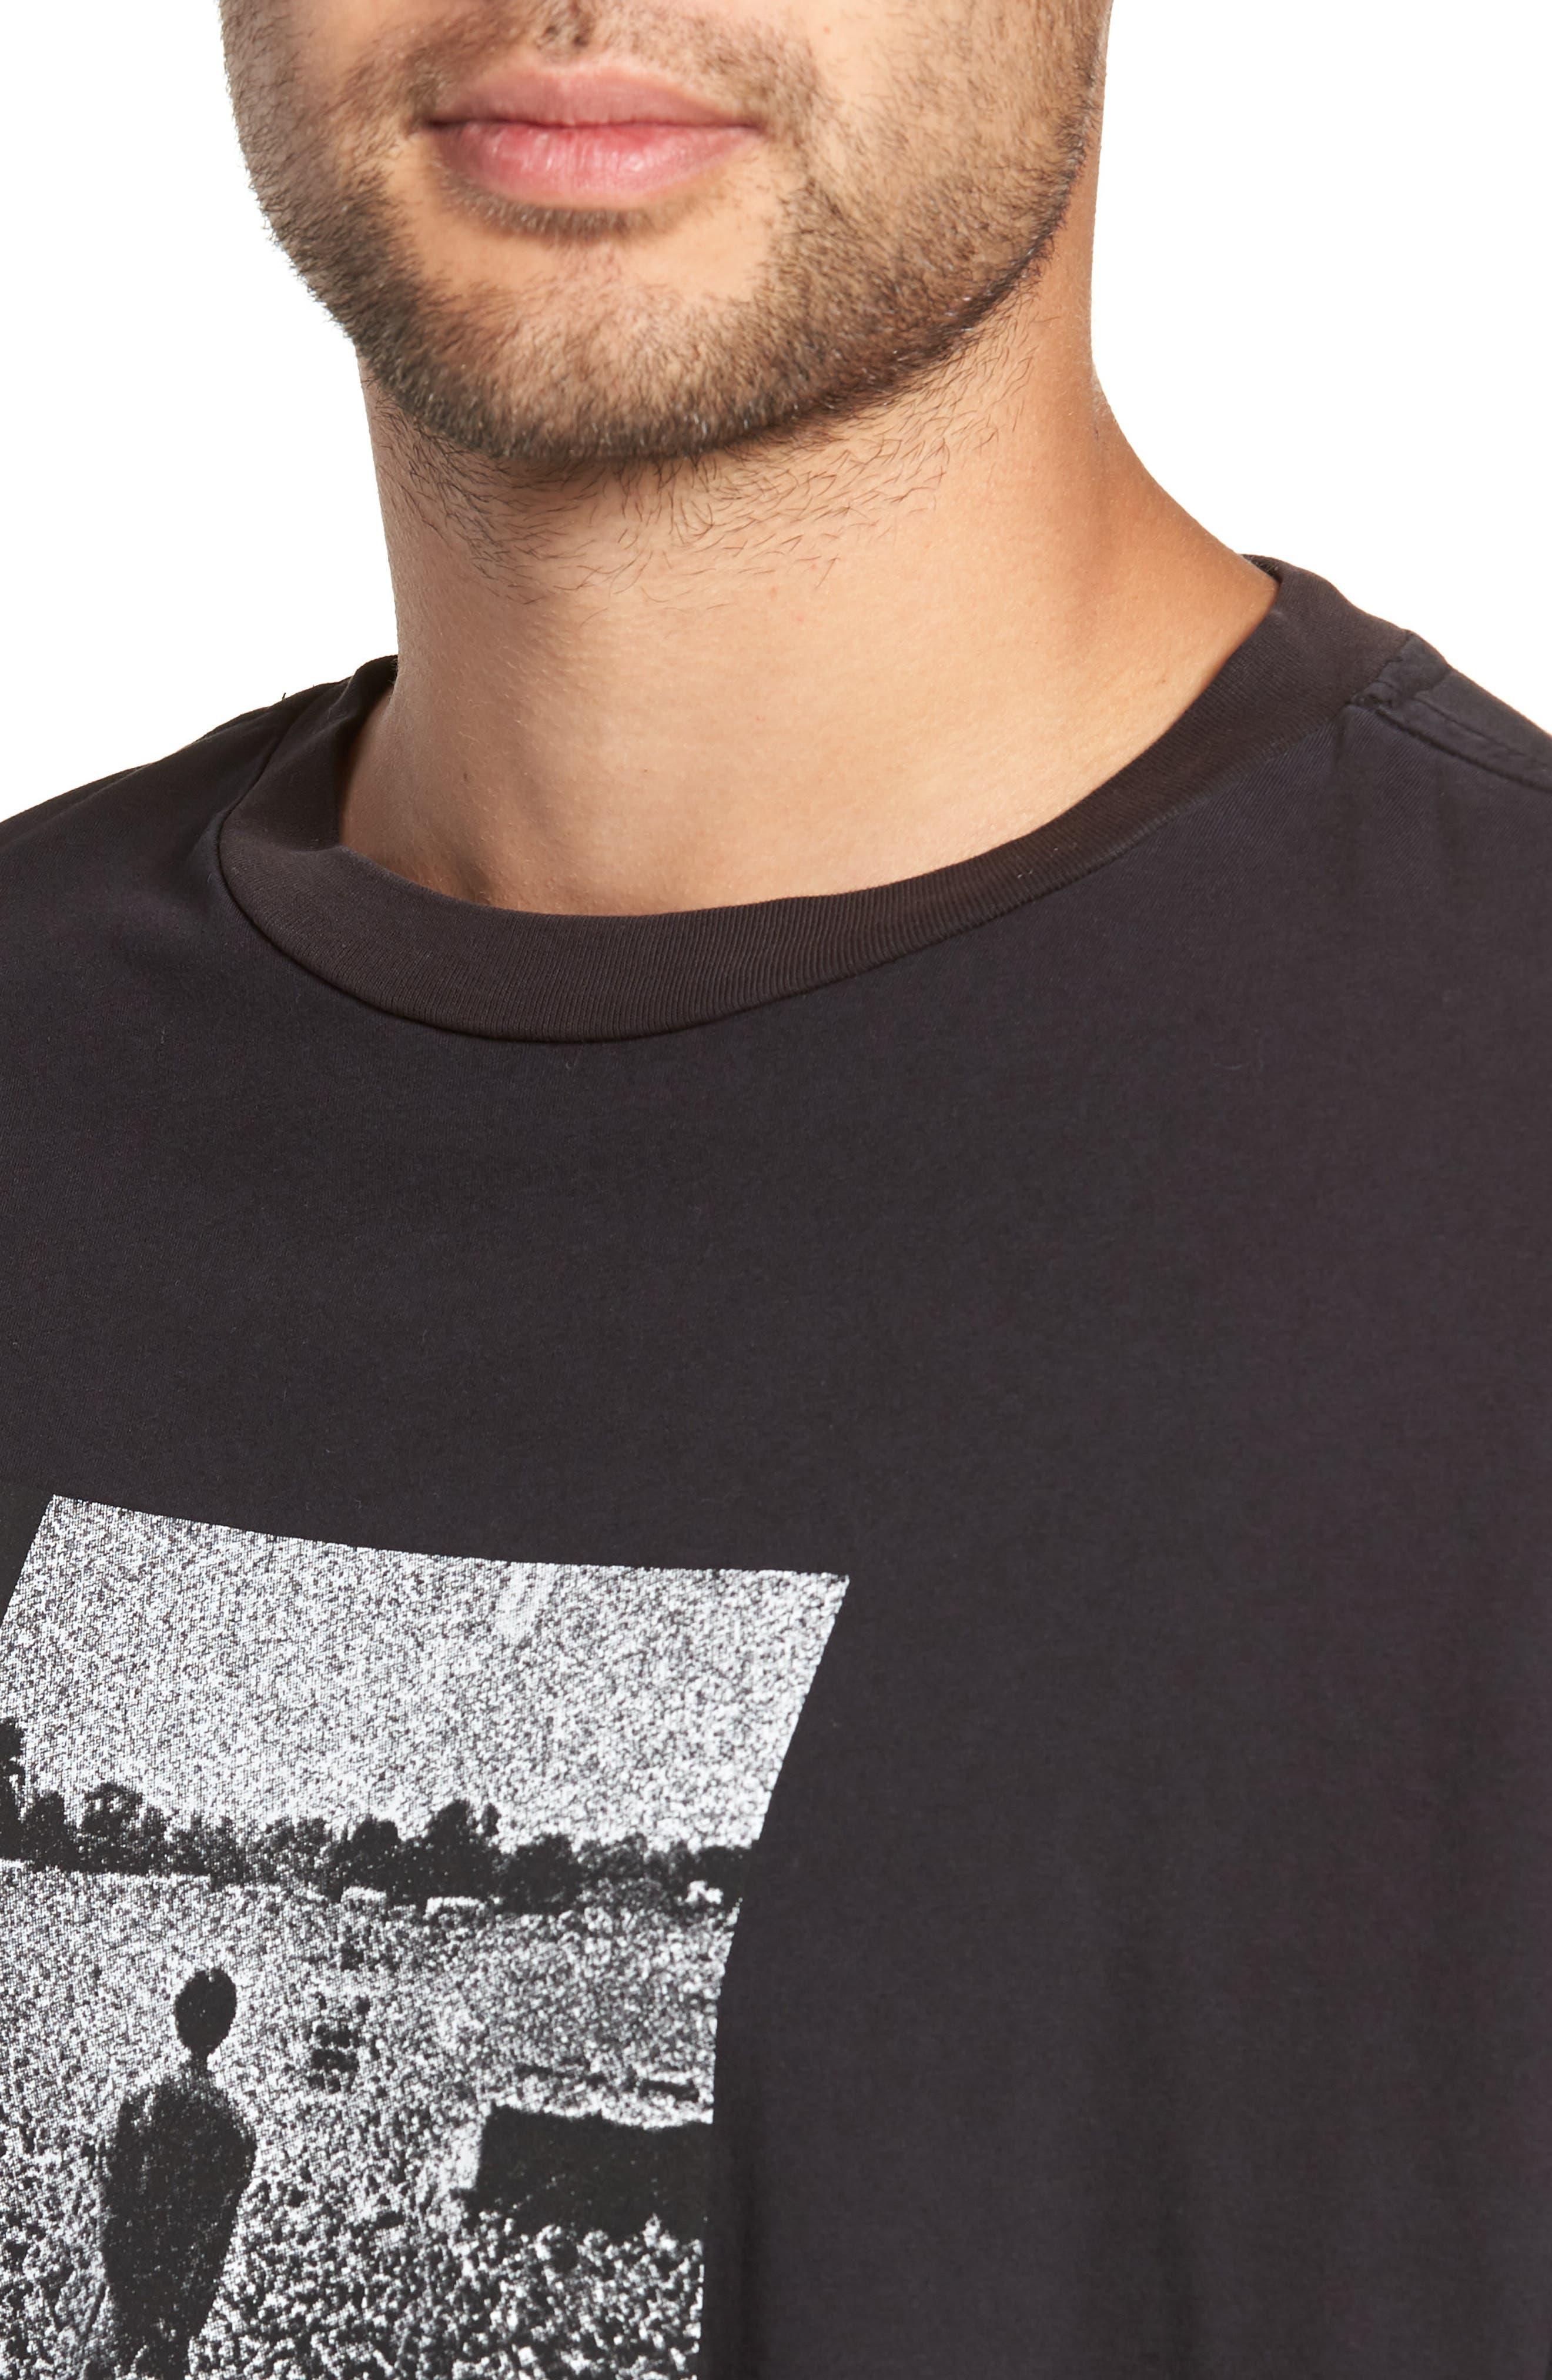 Oasis Oversize Long Sleeve T-Shirt,                             Alternate thumbnail 4, color,                             001